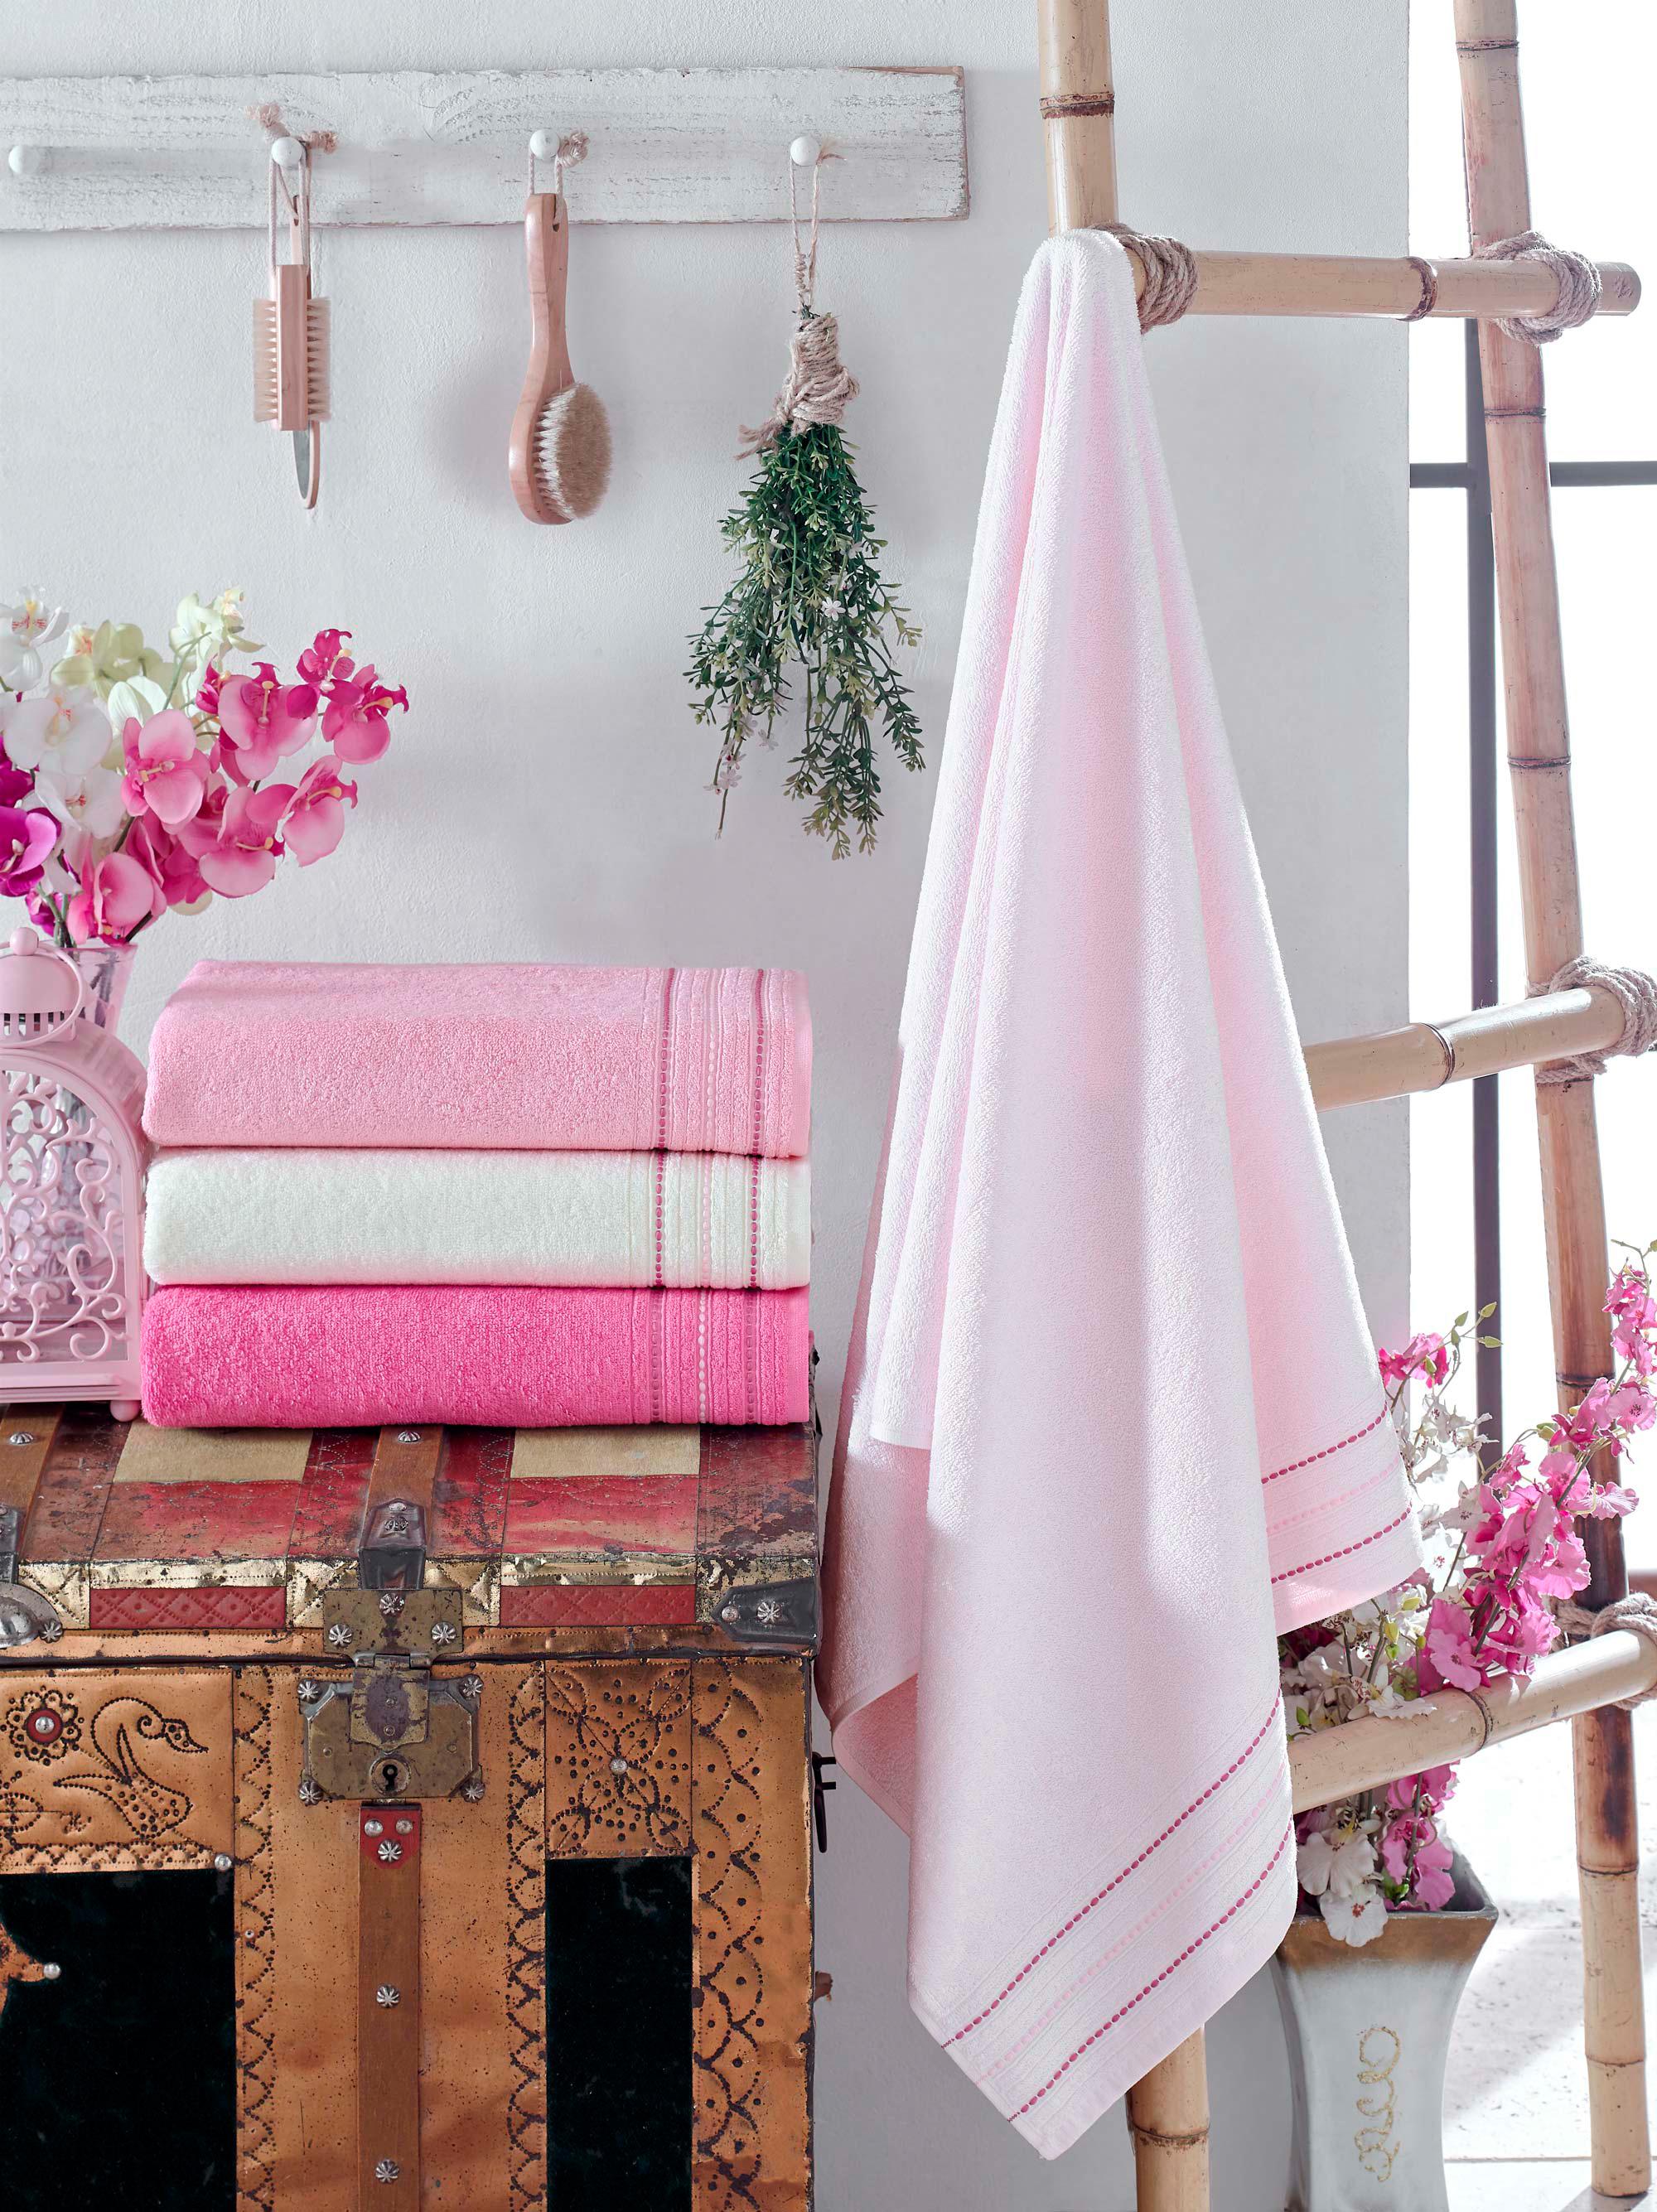 Купить Полотенца DO'n'CO, Полотенце Adela (50х90 см - 4 шт), Турция, Розовый, Бамбук